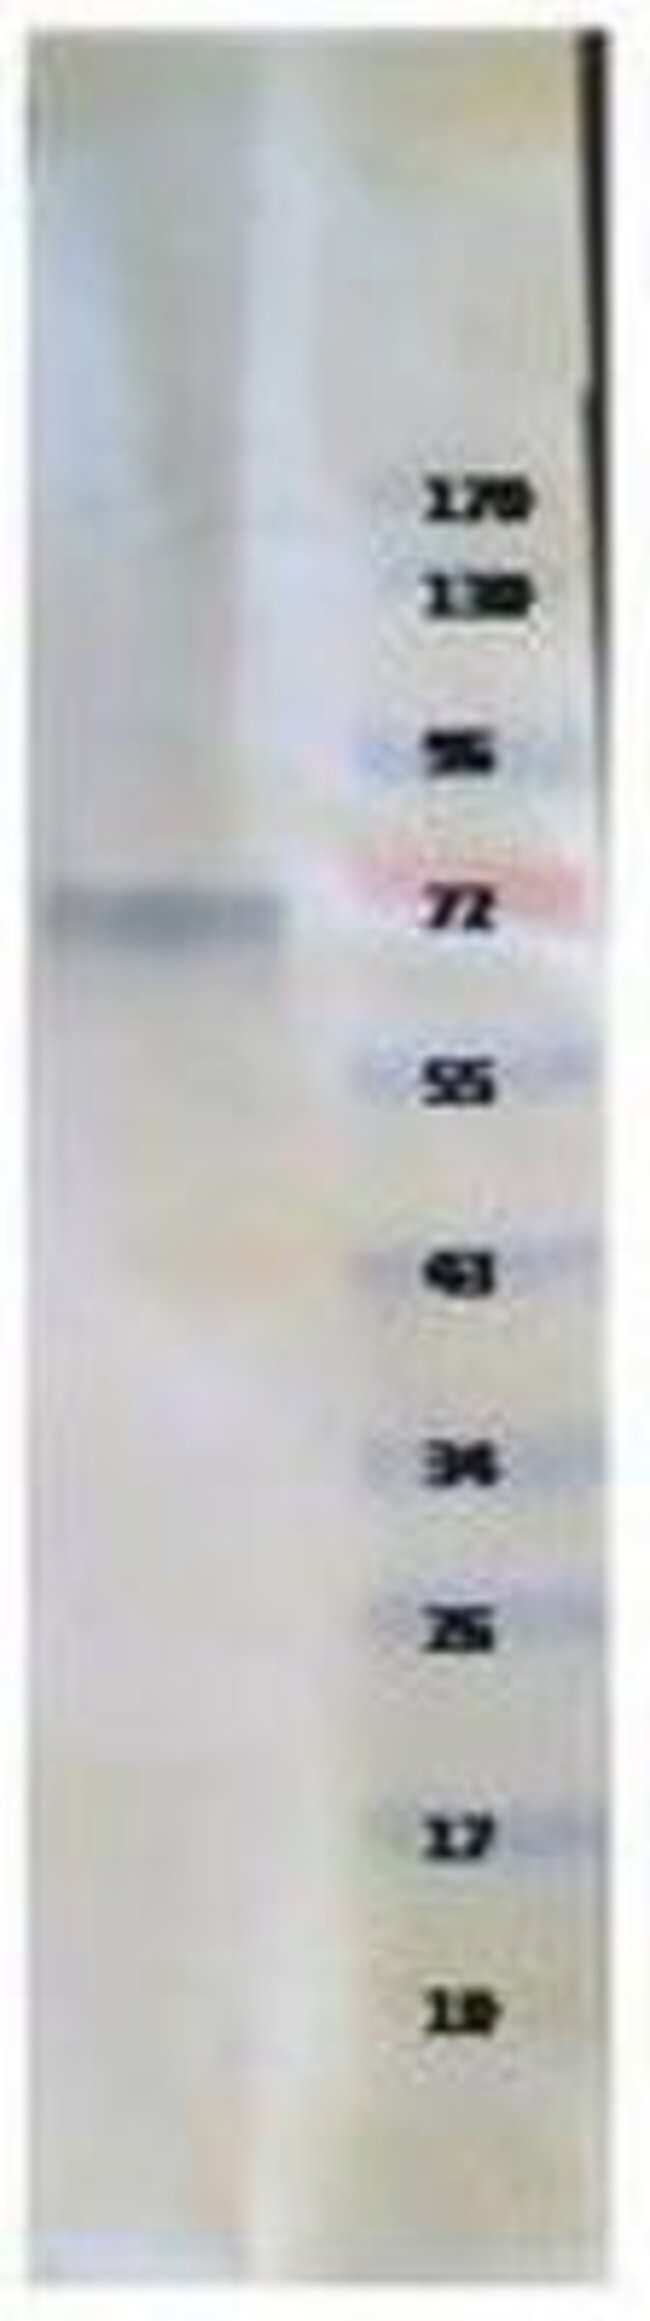 Novus Biologicals Human Tyrosine Hydroxylase Protein 0.01mg; Unlabeled:Life